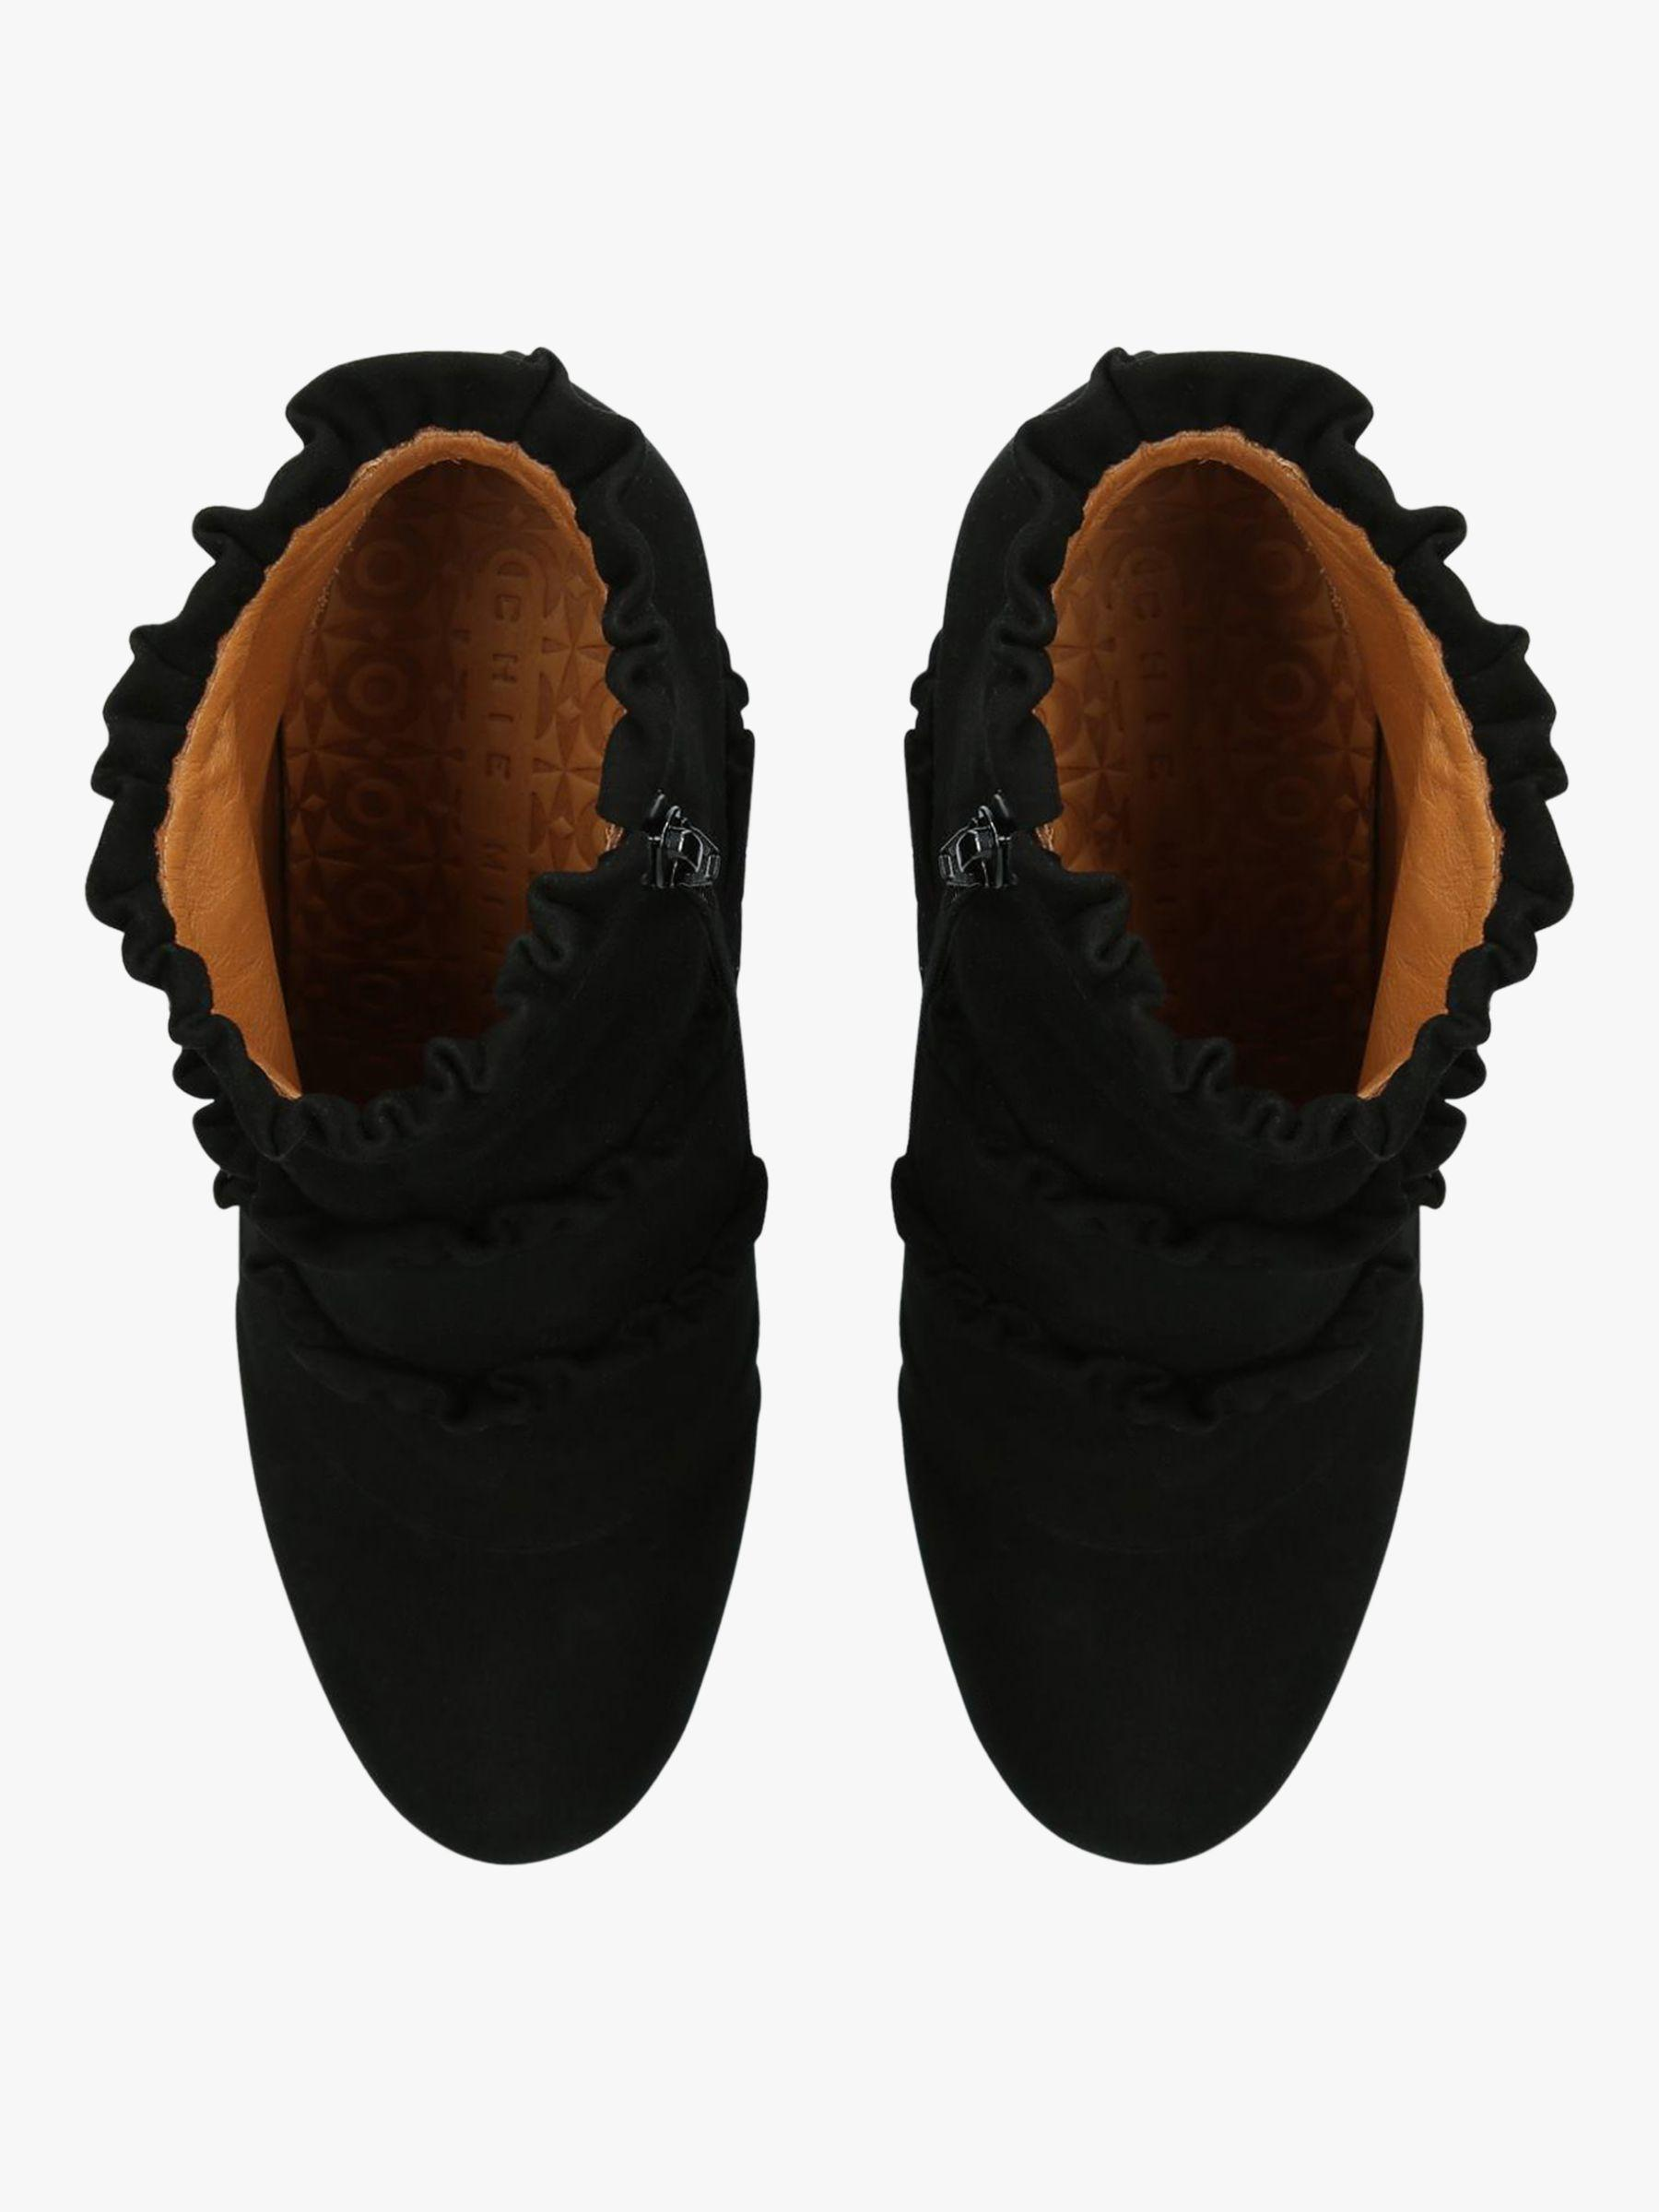 ad0c6f527212 Chie Mihara - Black Kaftan Ruffle Block Heel Ankle Boots - Lyst. View  fullscreen